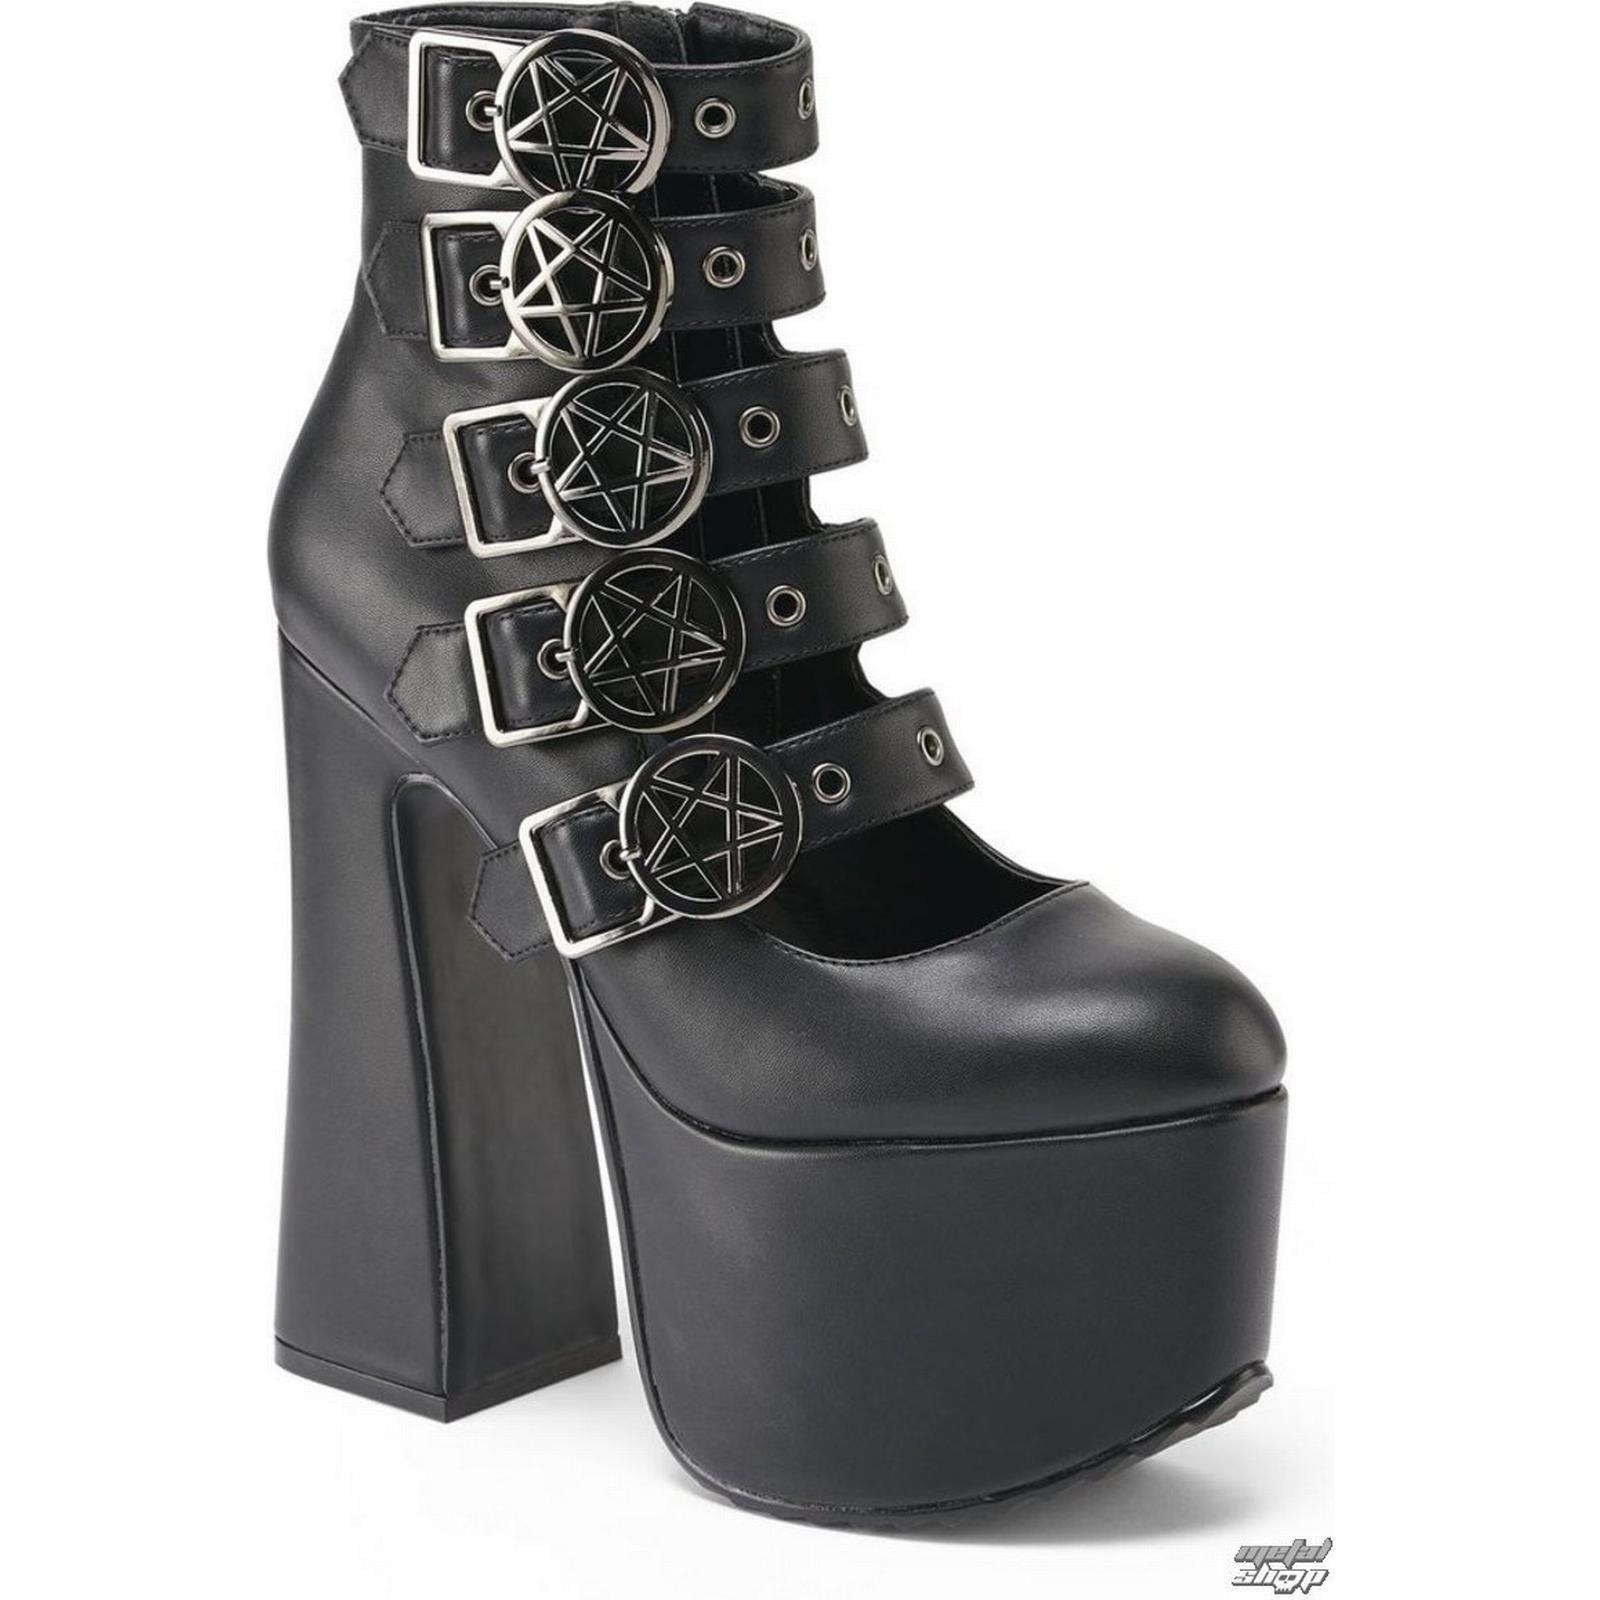 KILLSTAR high - heels women's - Burial - high KILLSTAR - K-FTW-F-2306 25e5a8